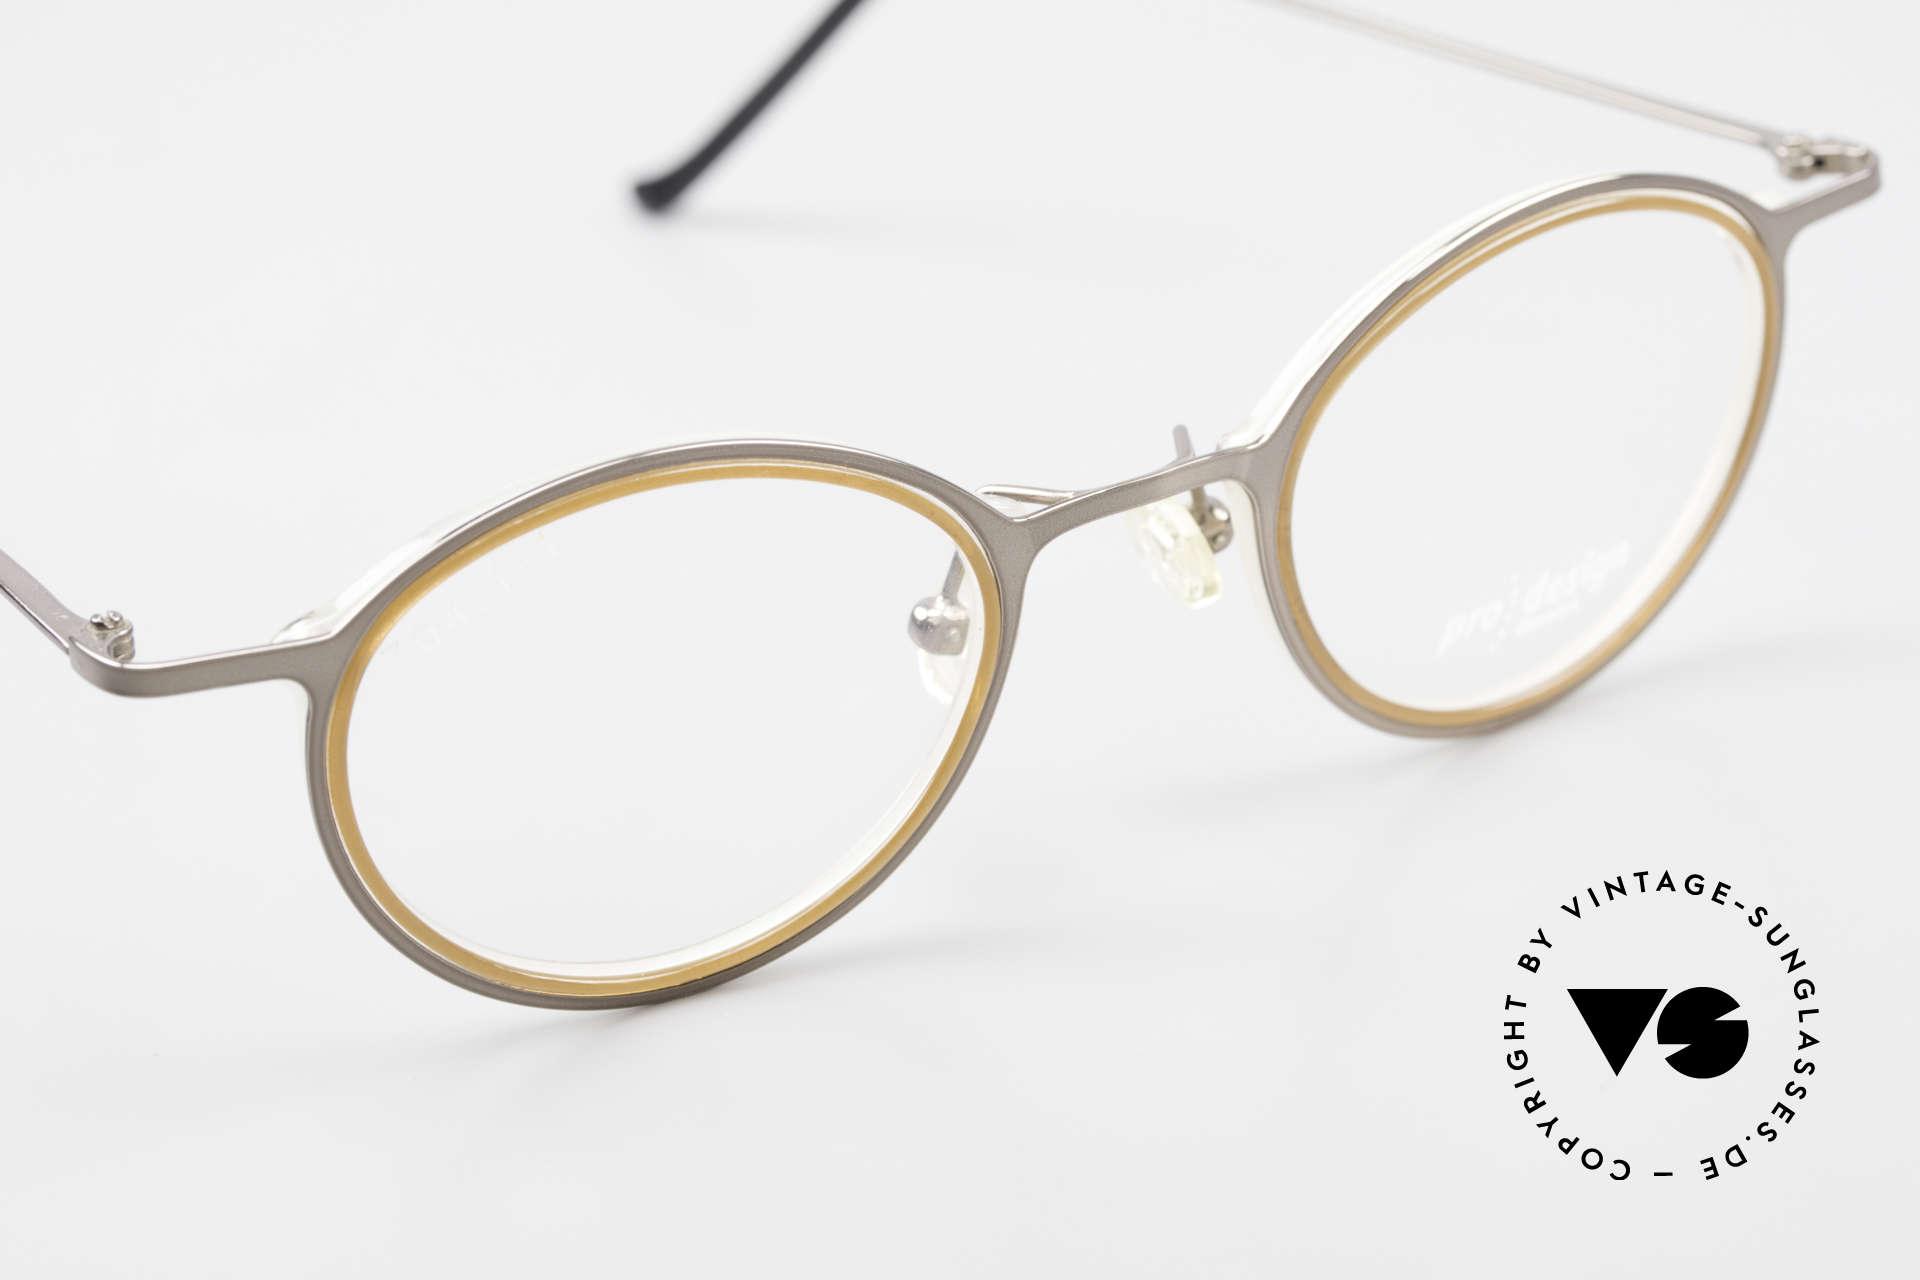 ProDesign 7041 Unisex Panto Glasses 90s 2000s, UNWORN (like all our vintage ProDesign eyewear), Made for Men and Women